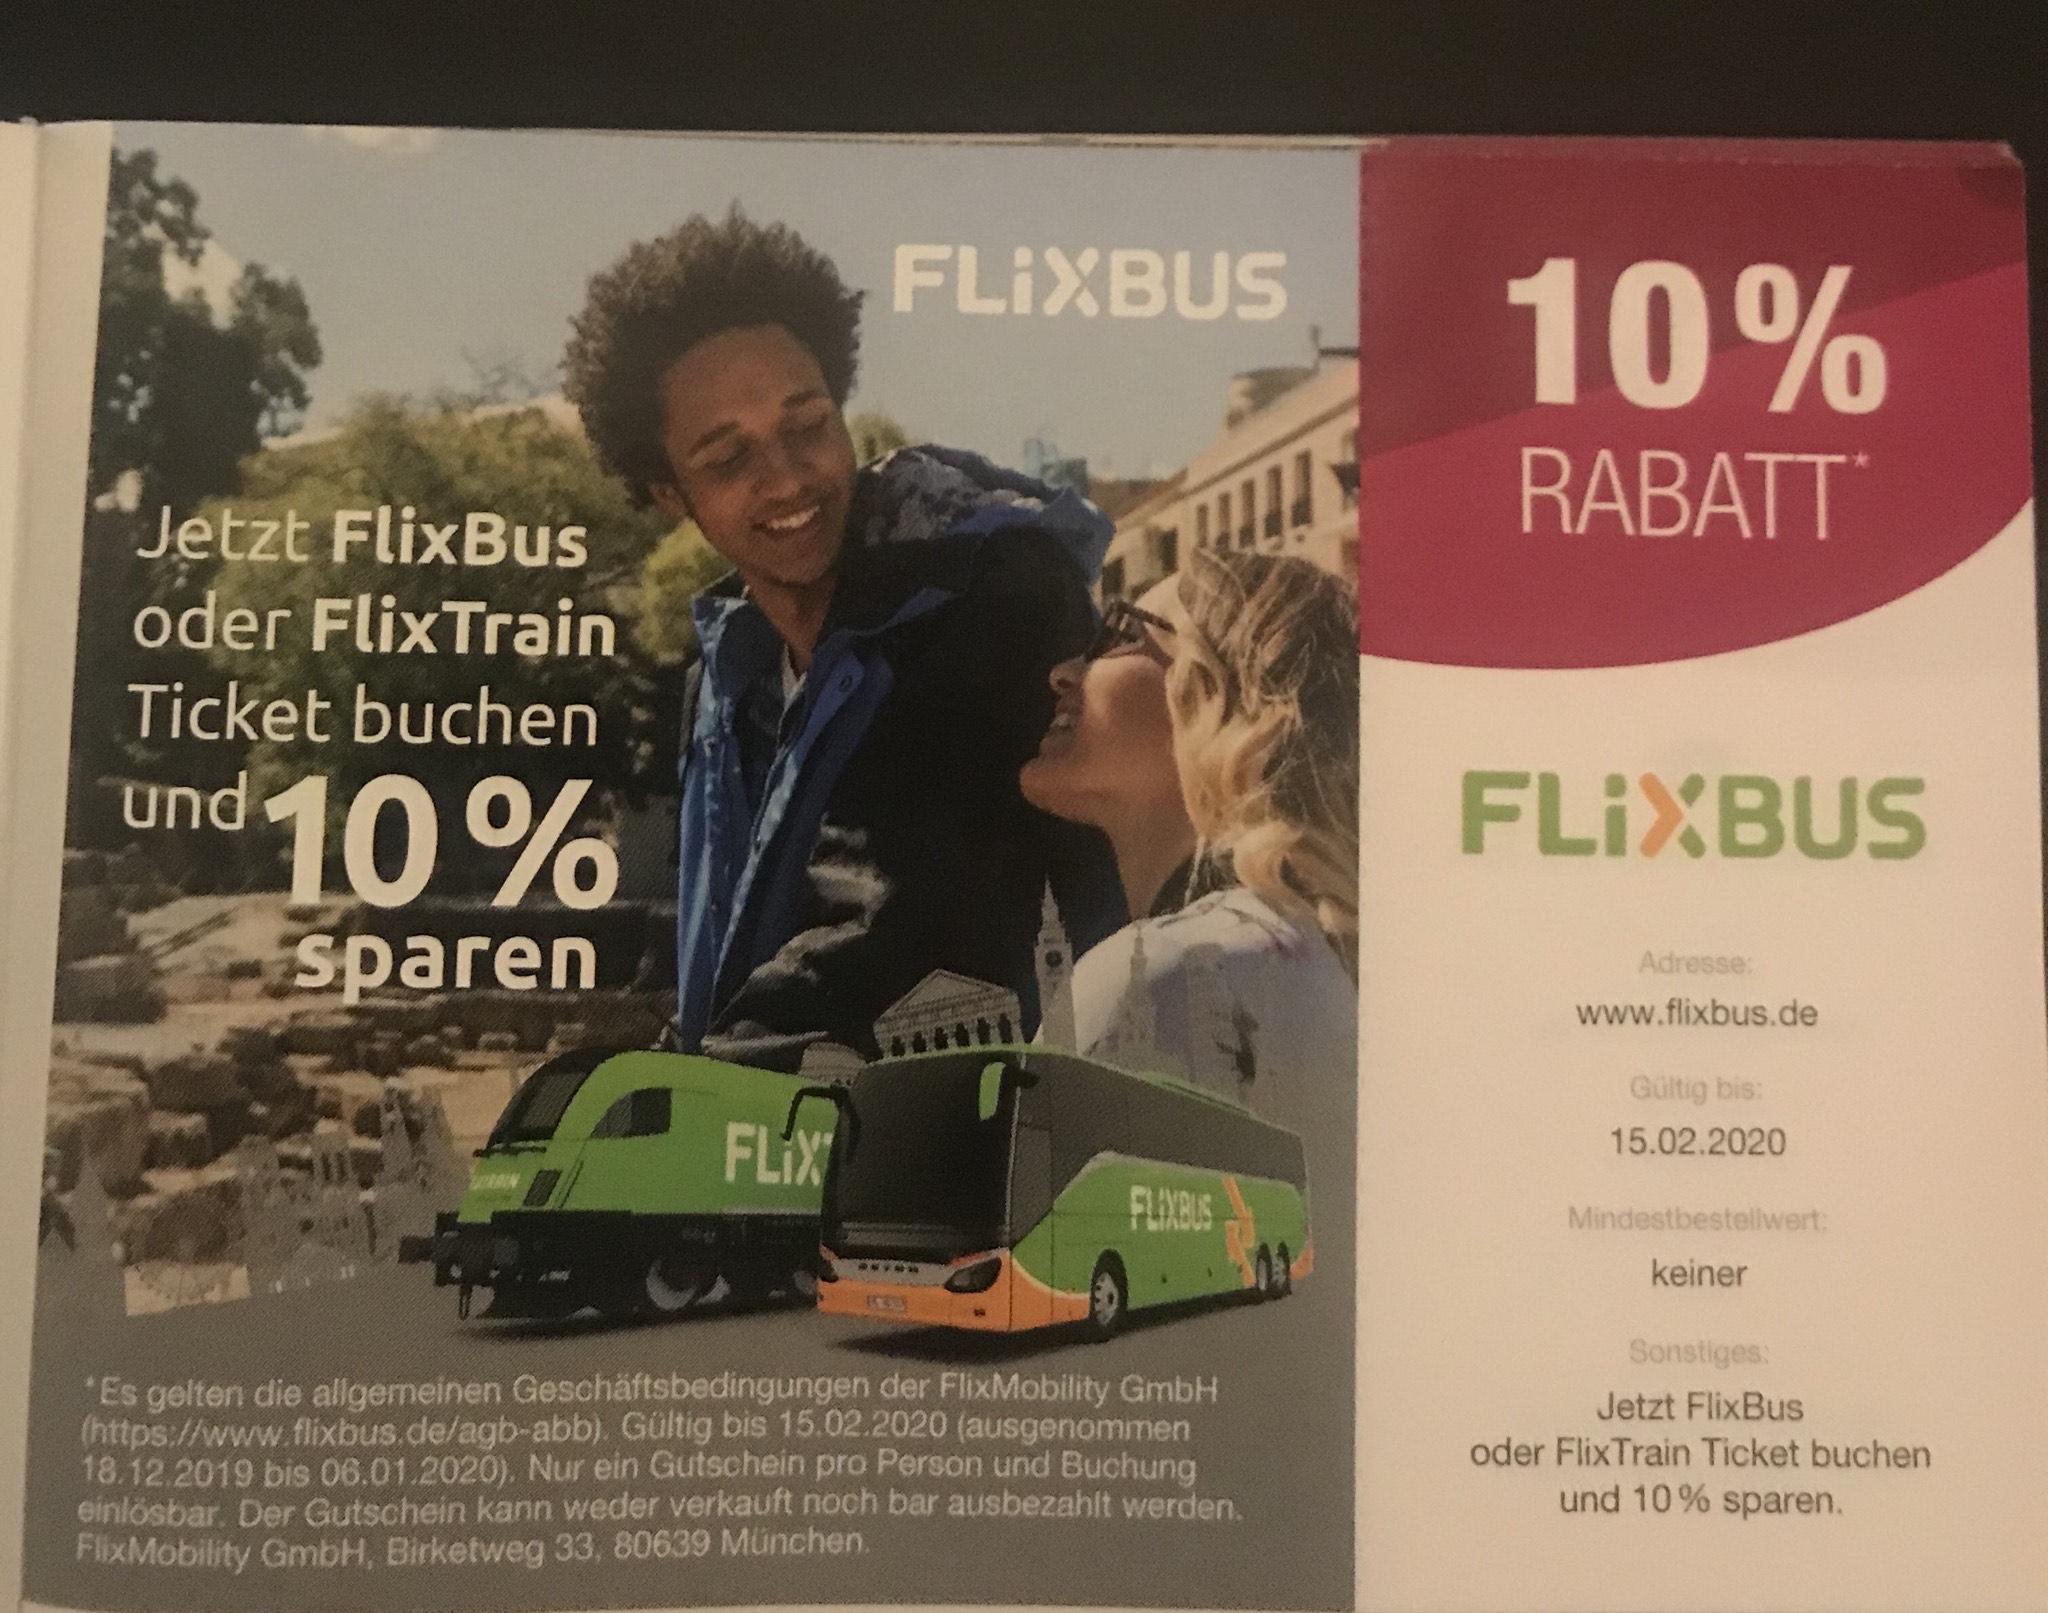 FlixBus FlixTrain 10% Rabatt ohne MBW